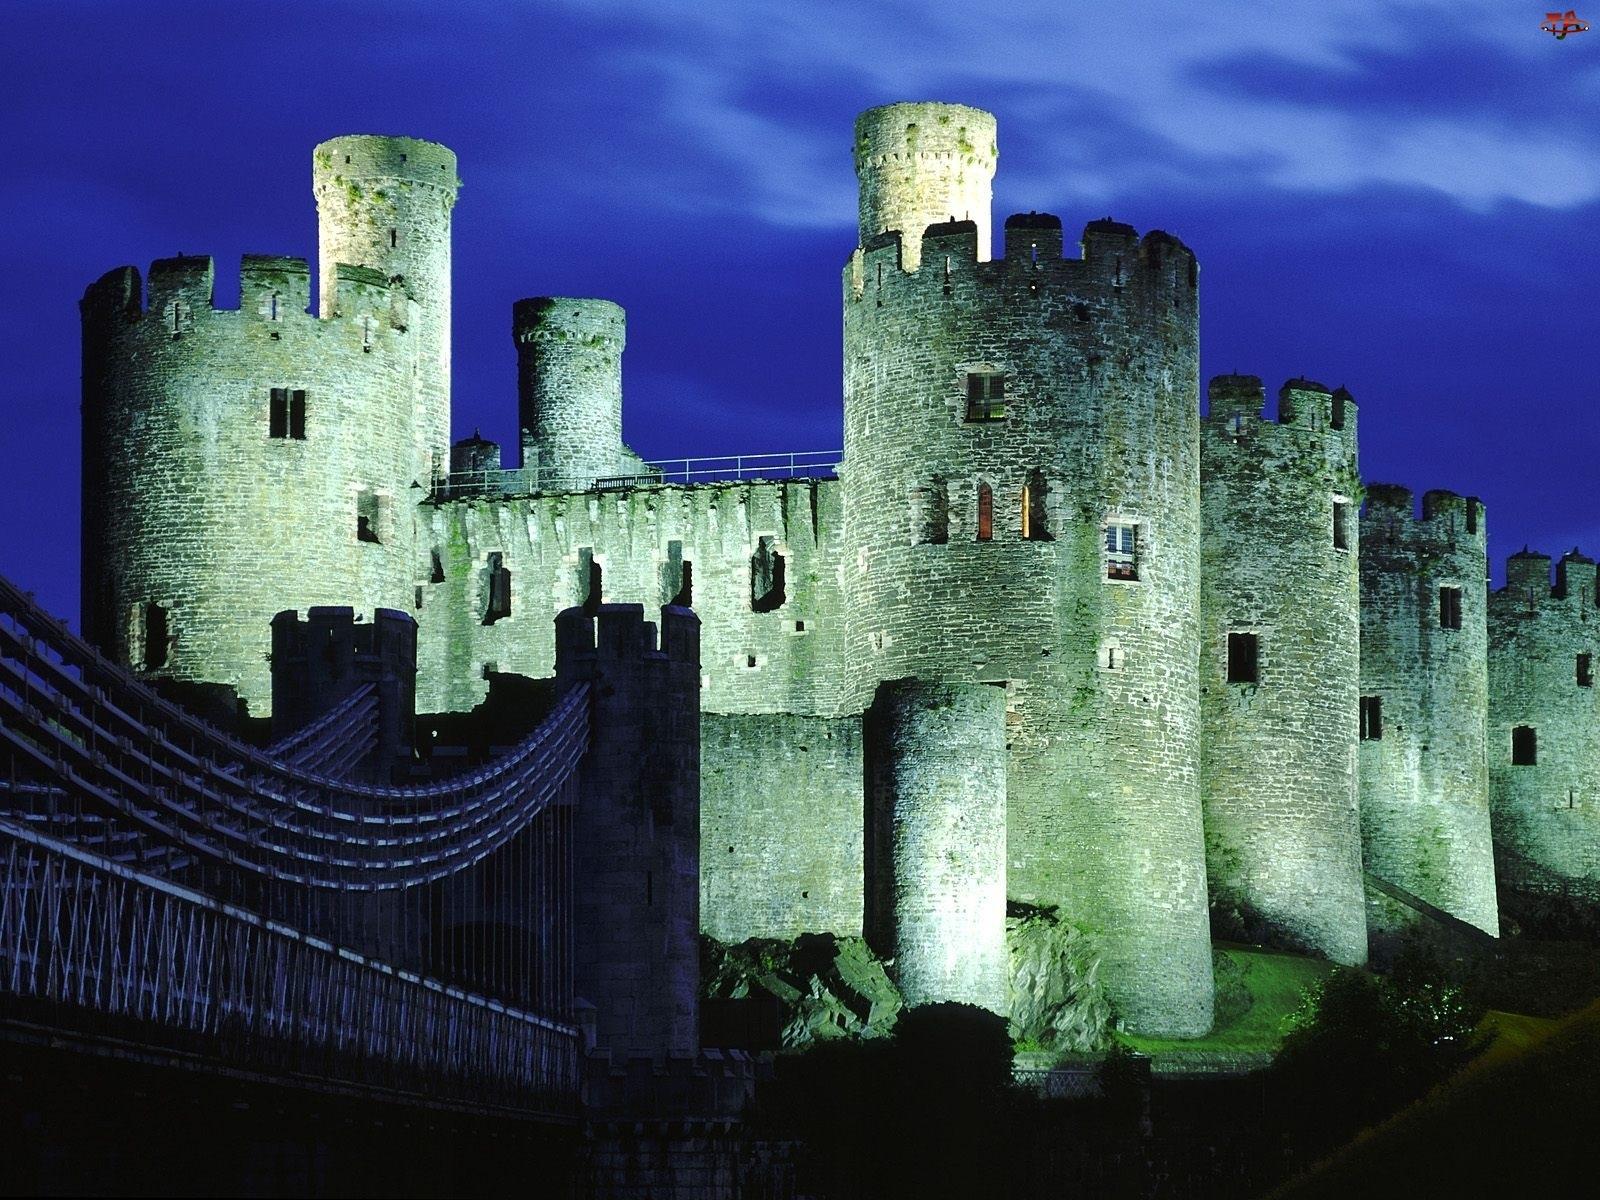 Brytania, Zamek, Gwynedd, Conwy, Wielka